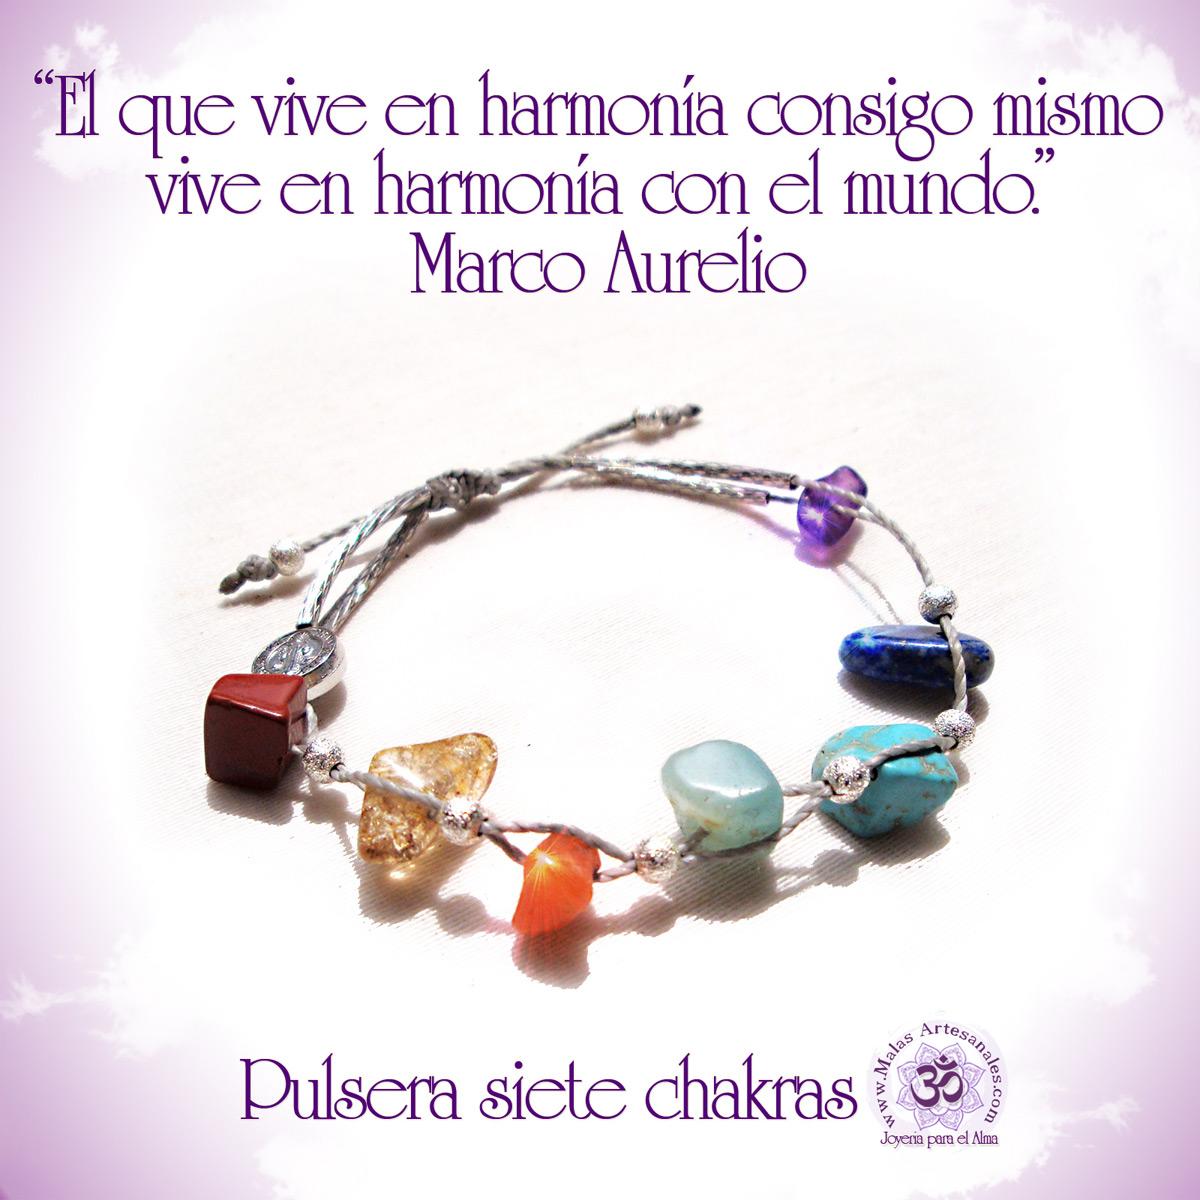 pulsera_espiritual_artesanal_piedras_siete_chakras_luz_equilibrio_alegria